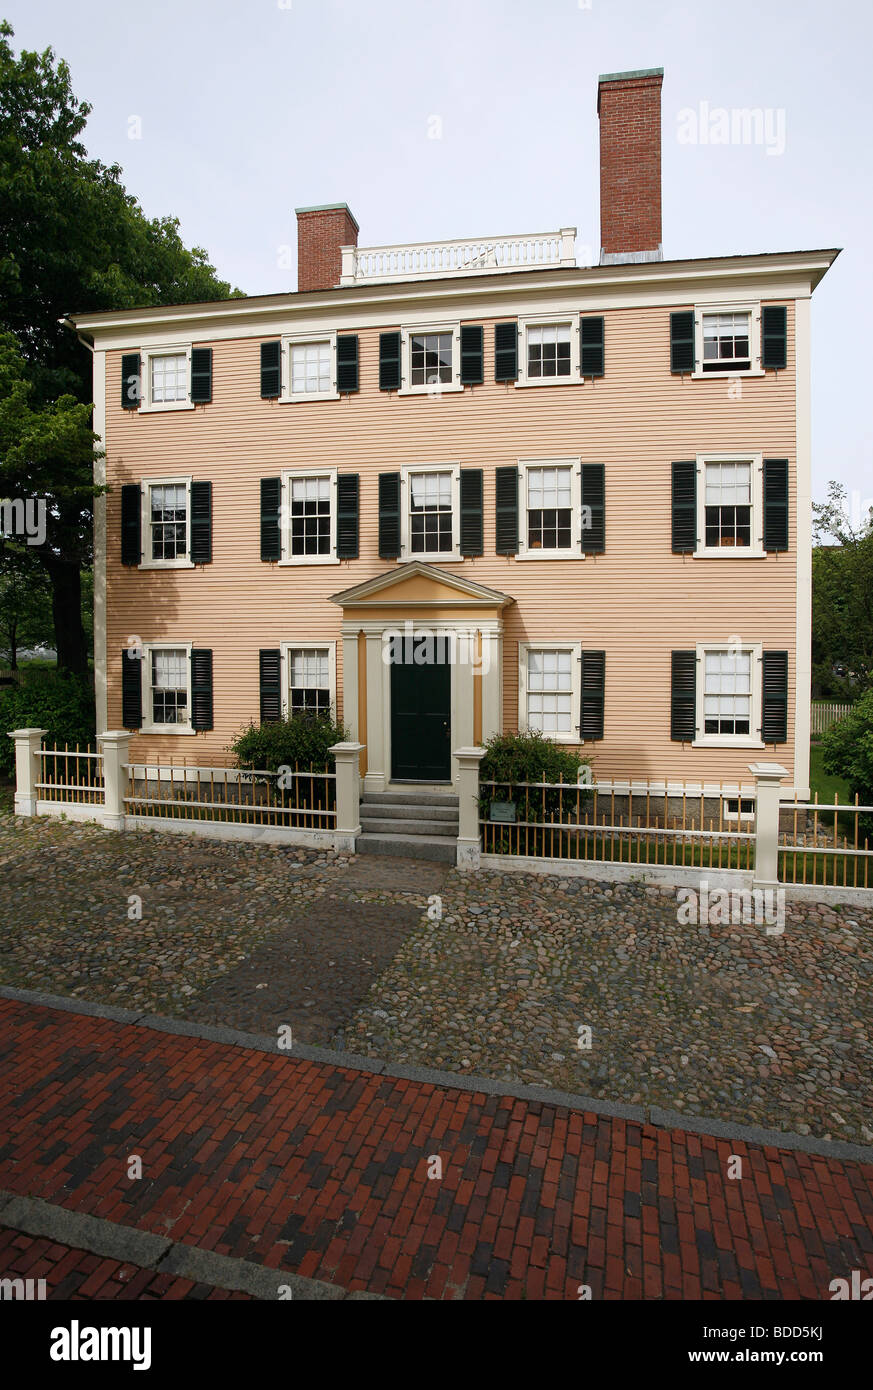 Hawkes House 1780, Salem, Massachusetts Stock Photo